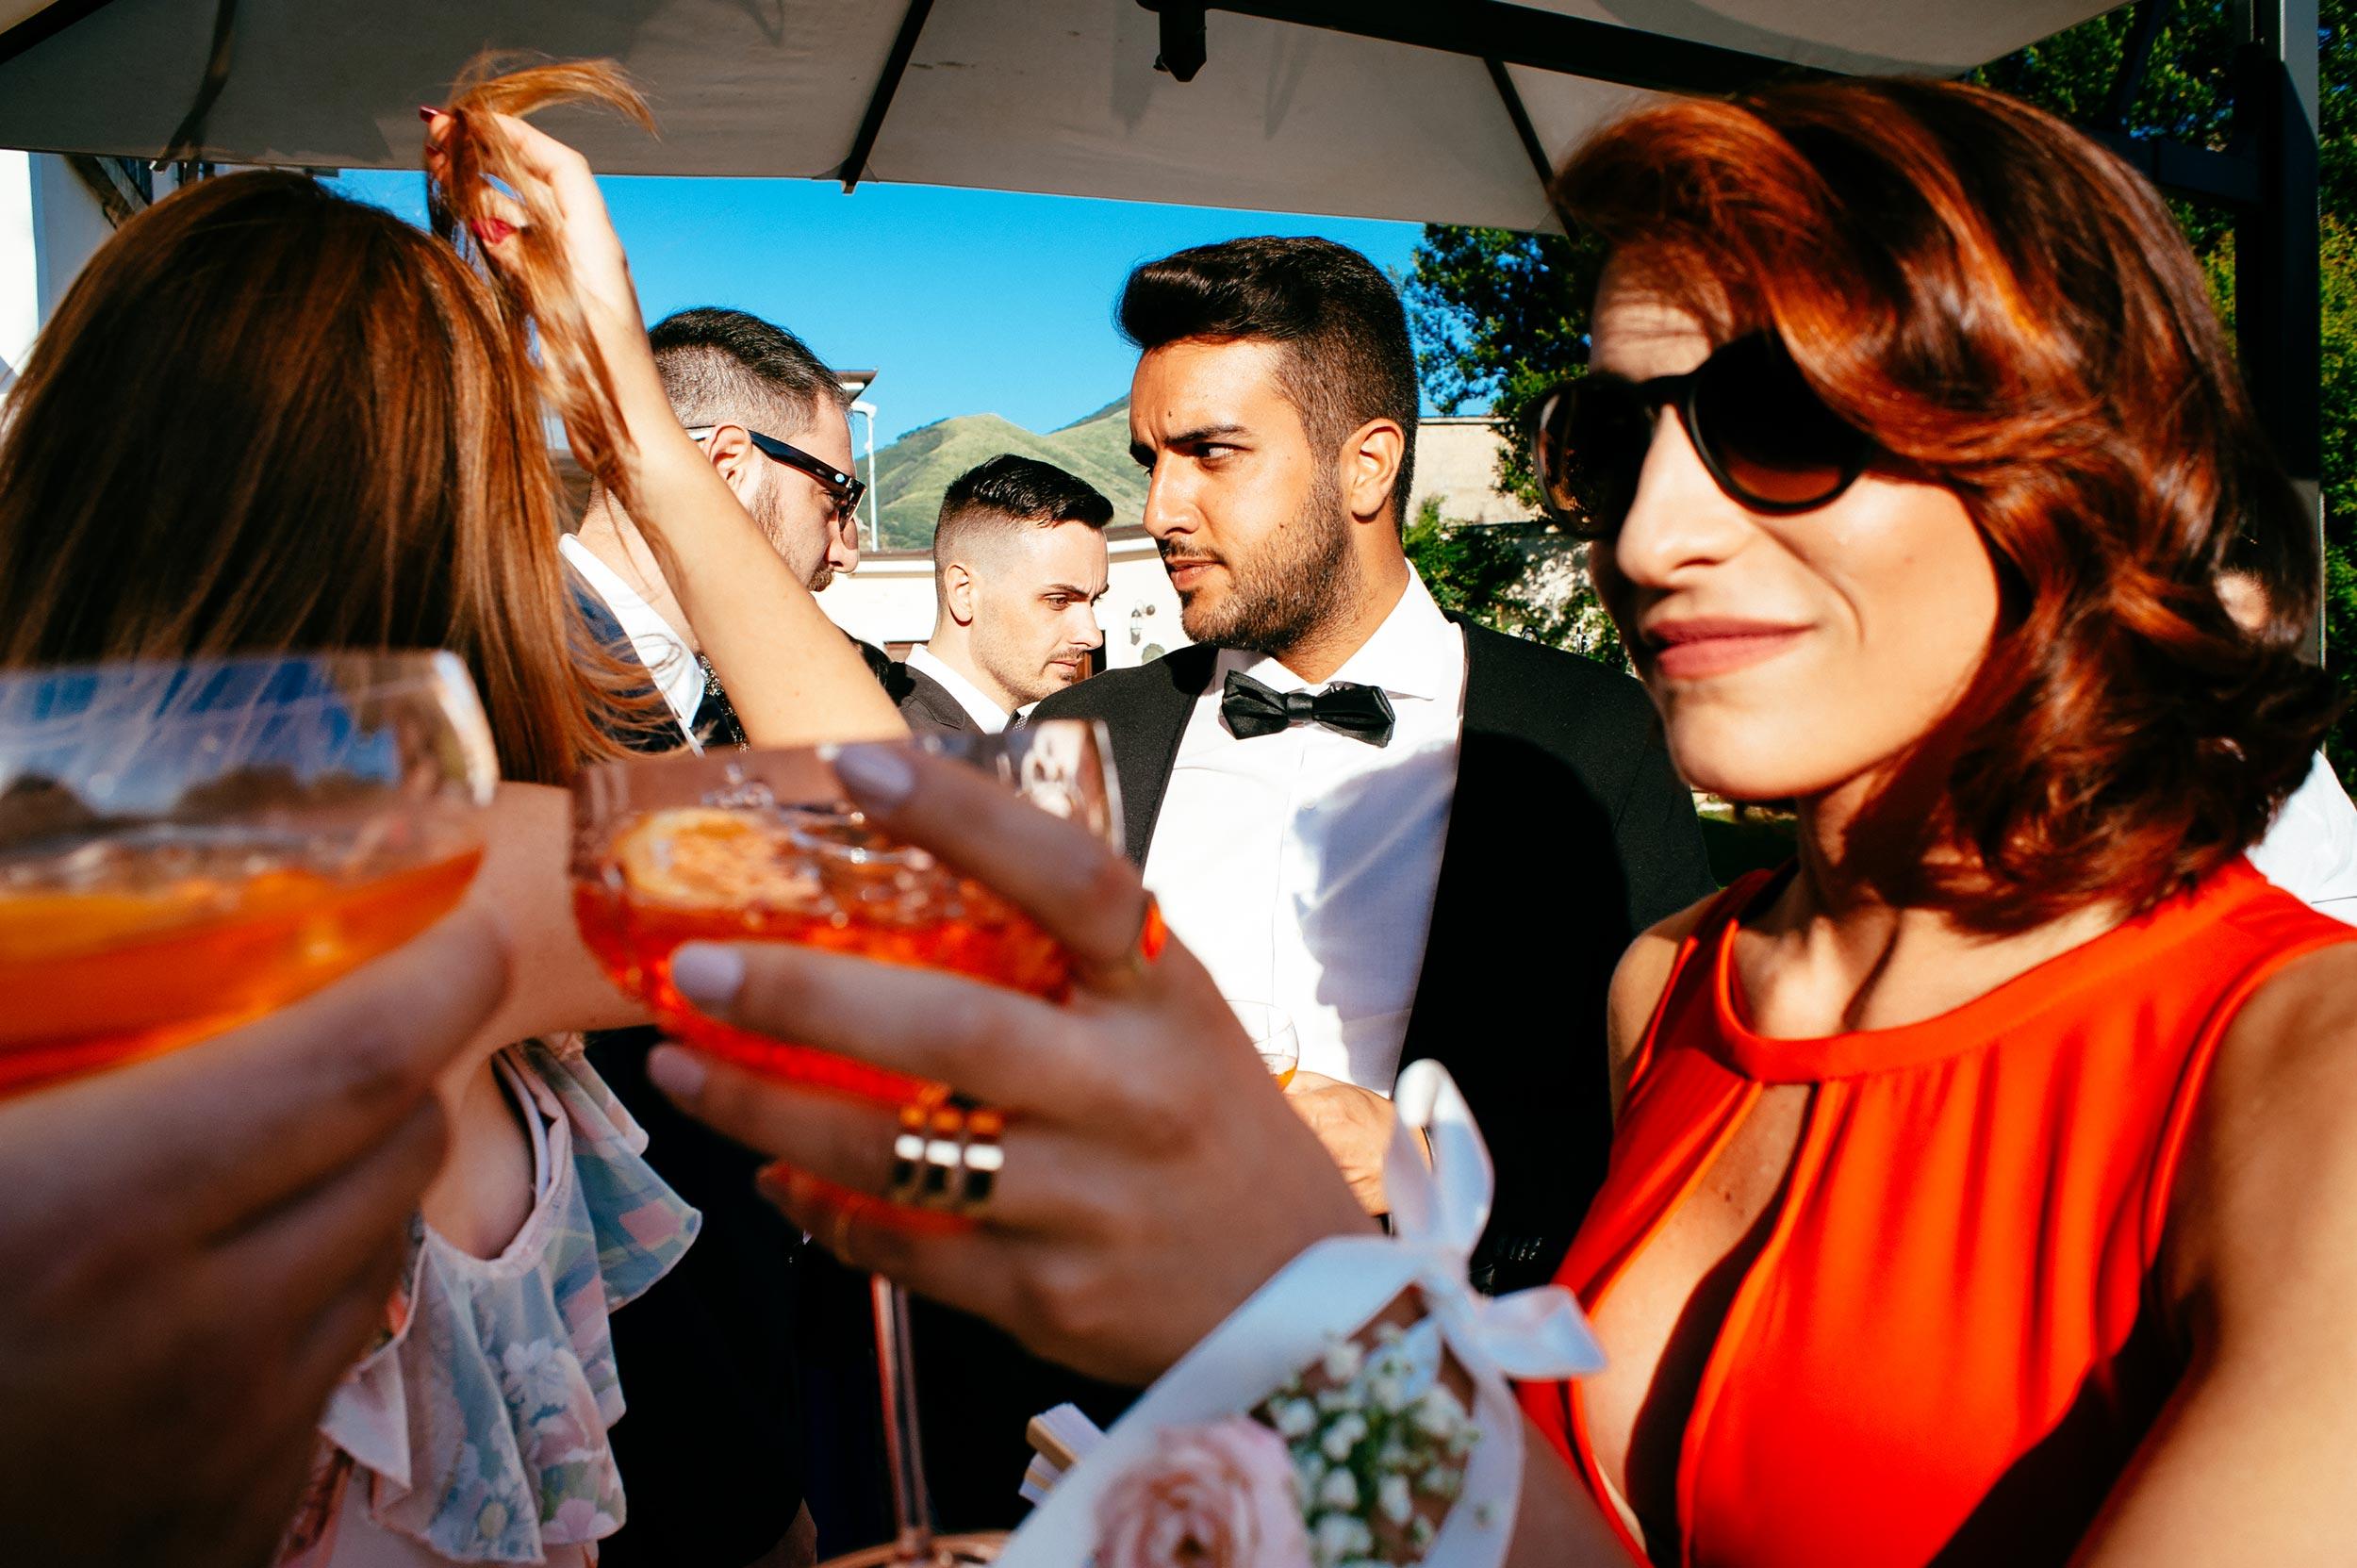 2016-Claudio-Teresa-Naples-Wedding-Photographer-Italy-Alessandro-Avenali-68.jpg